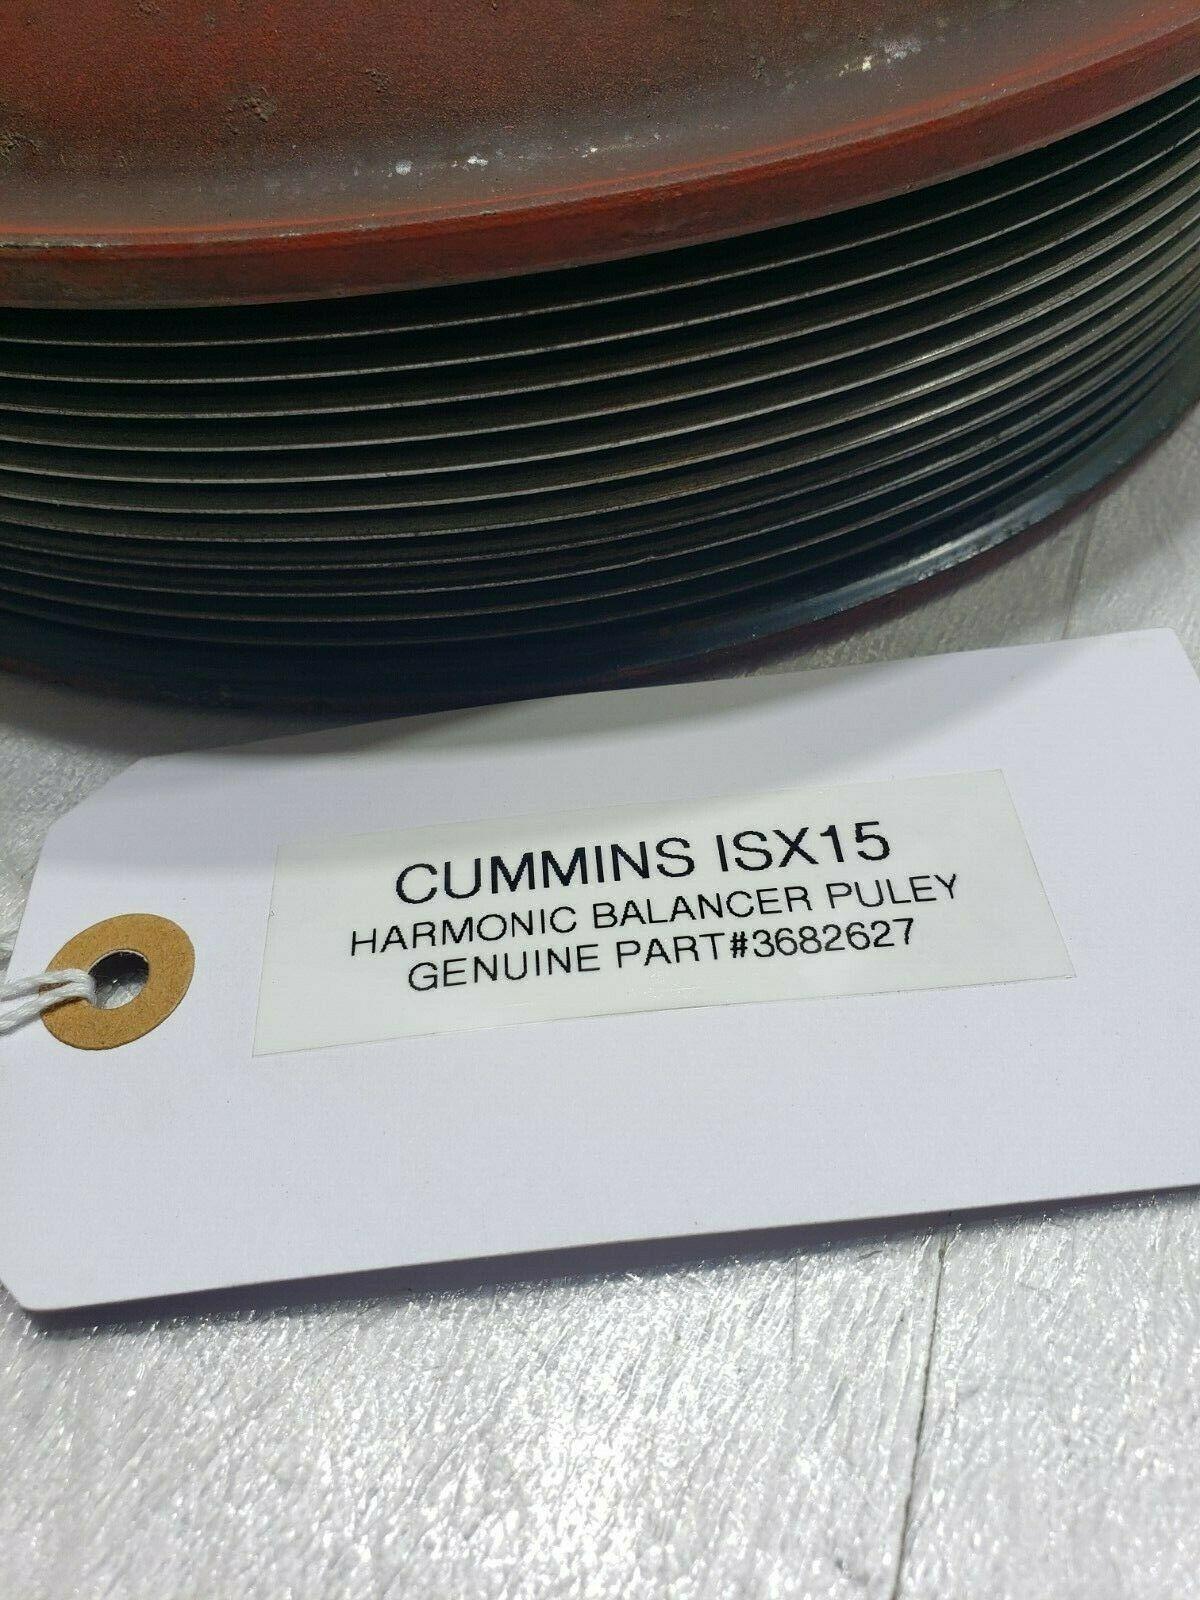 HARMONIC BALANCER Cummins ISX15 Pulley 3682627 OEM image 6